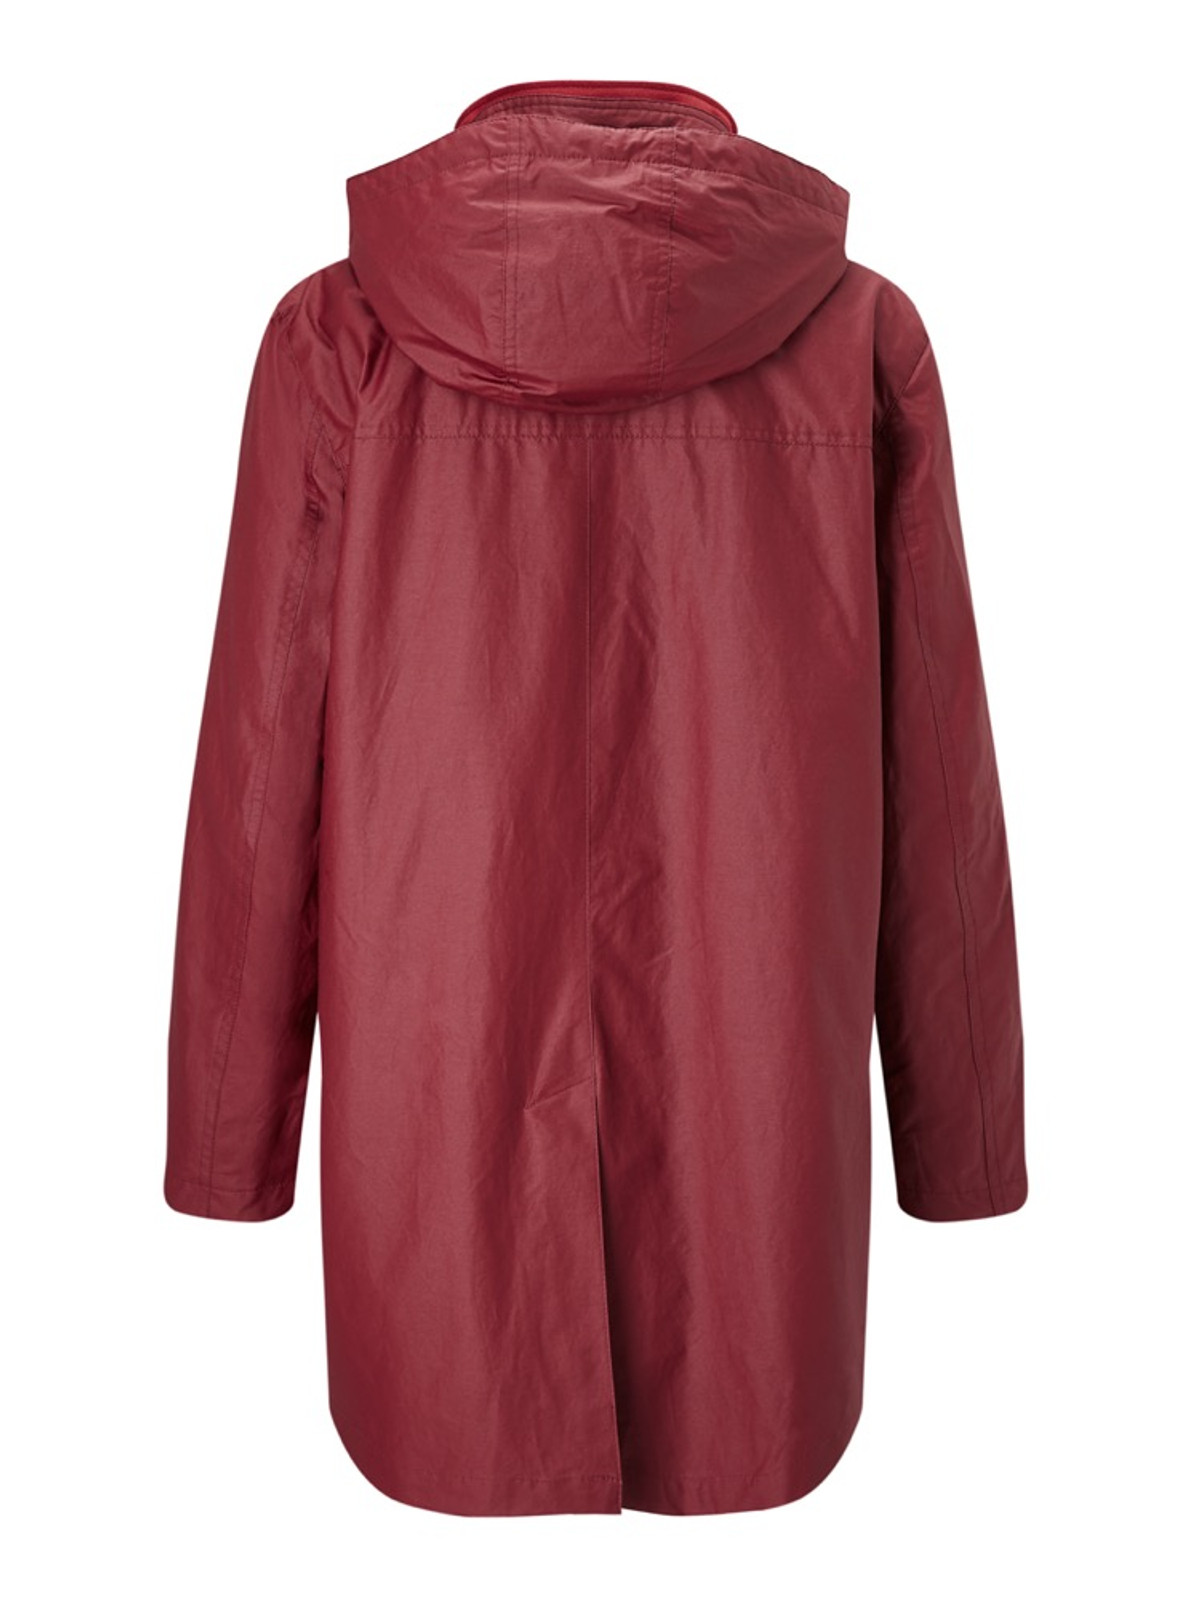 Wax Jacket, Cherry